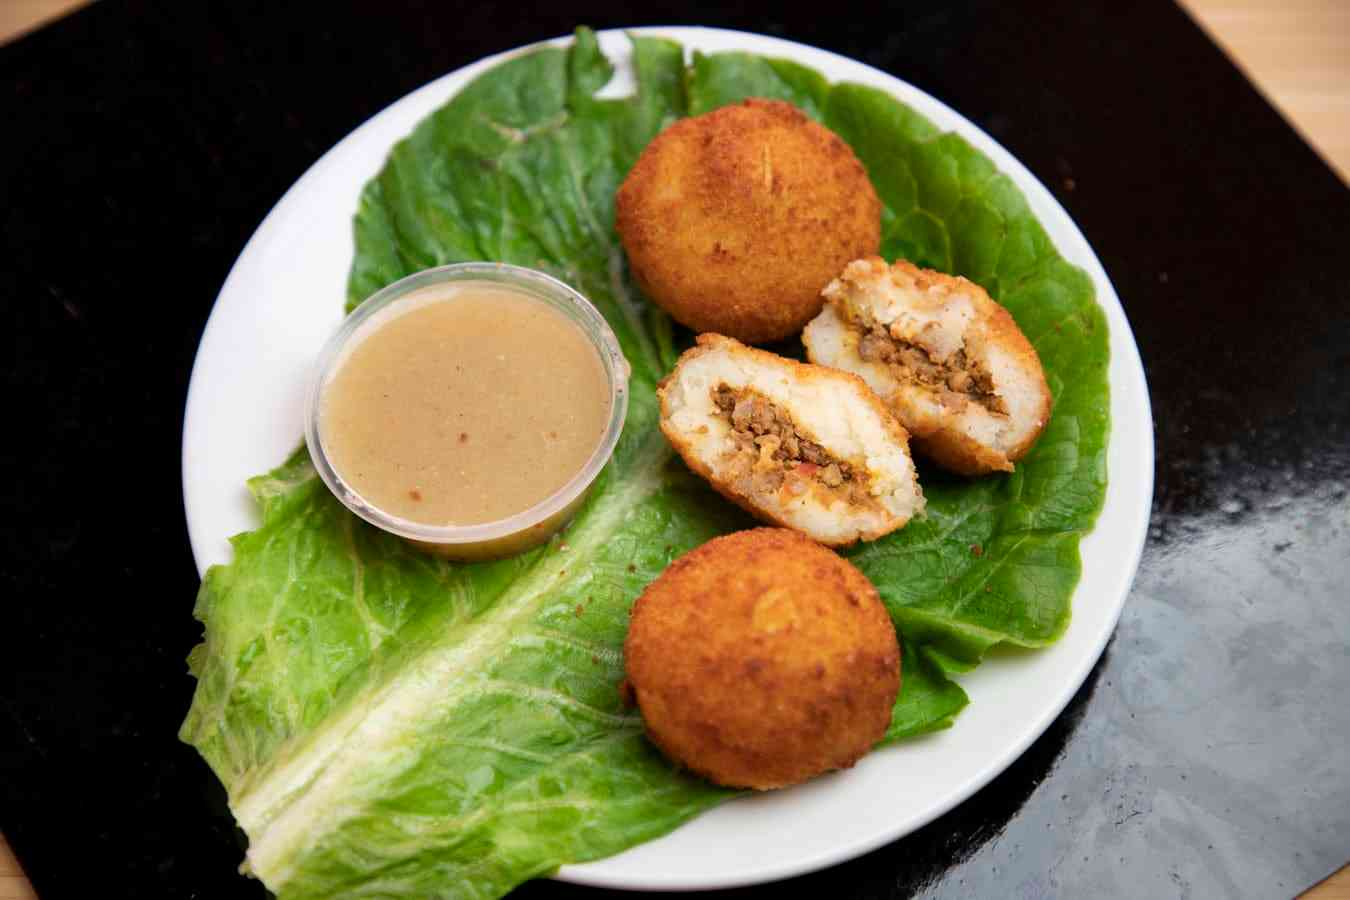 Papa Rellena- Stuffed Cuban Potatoes (3)